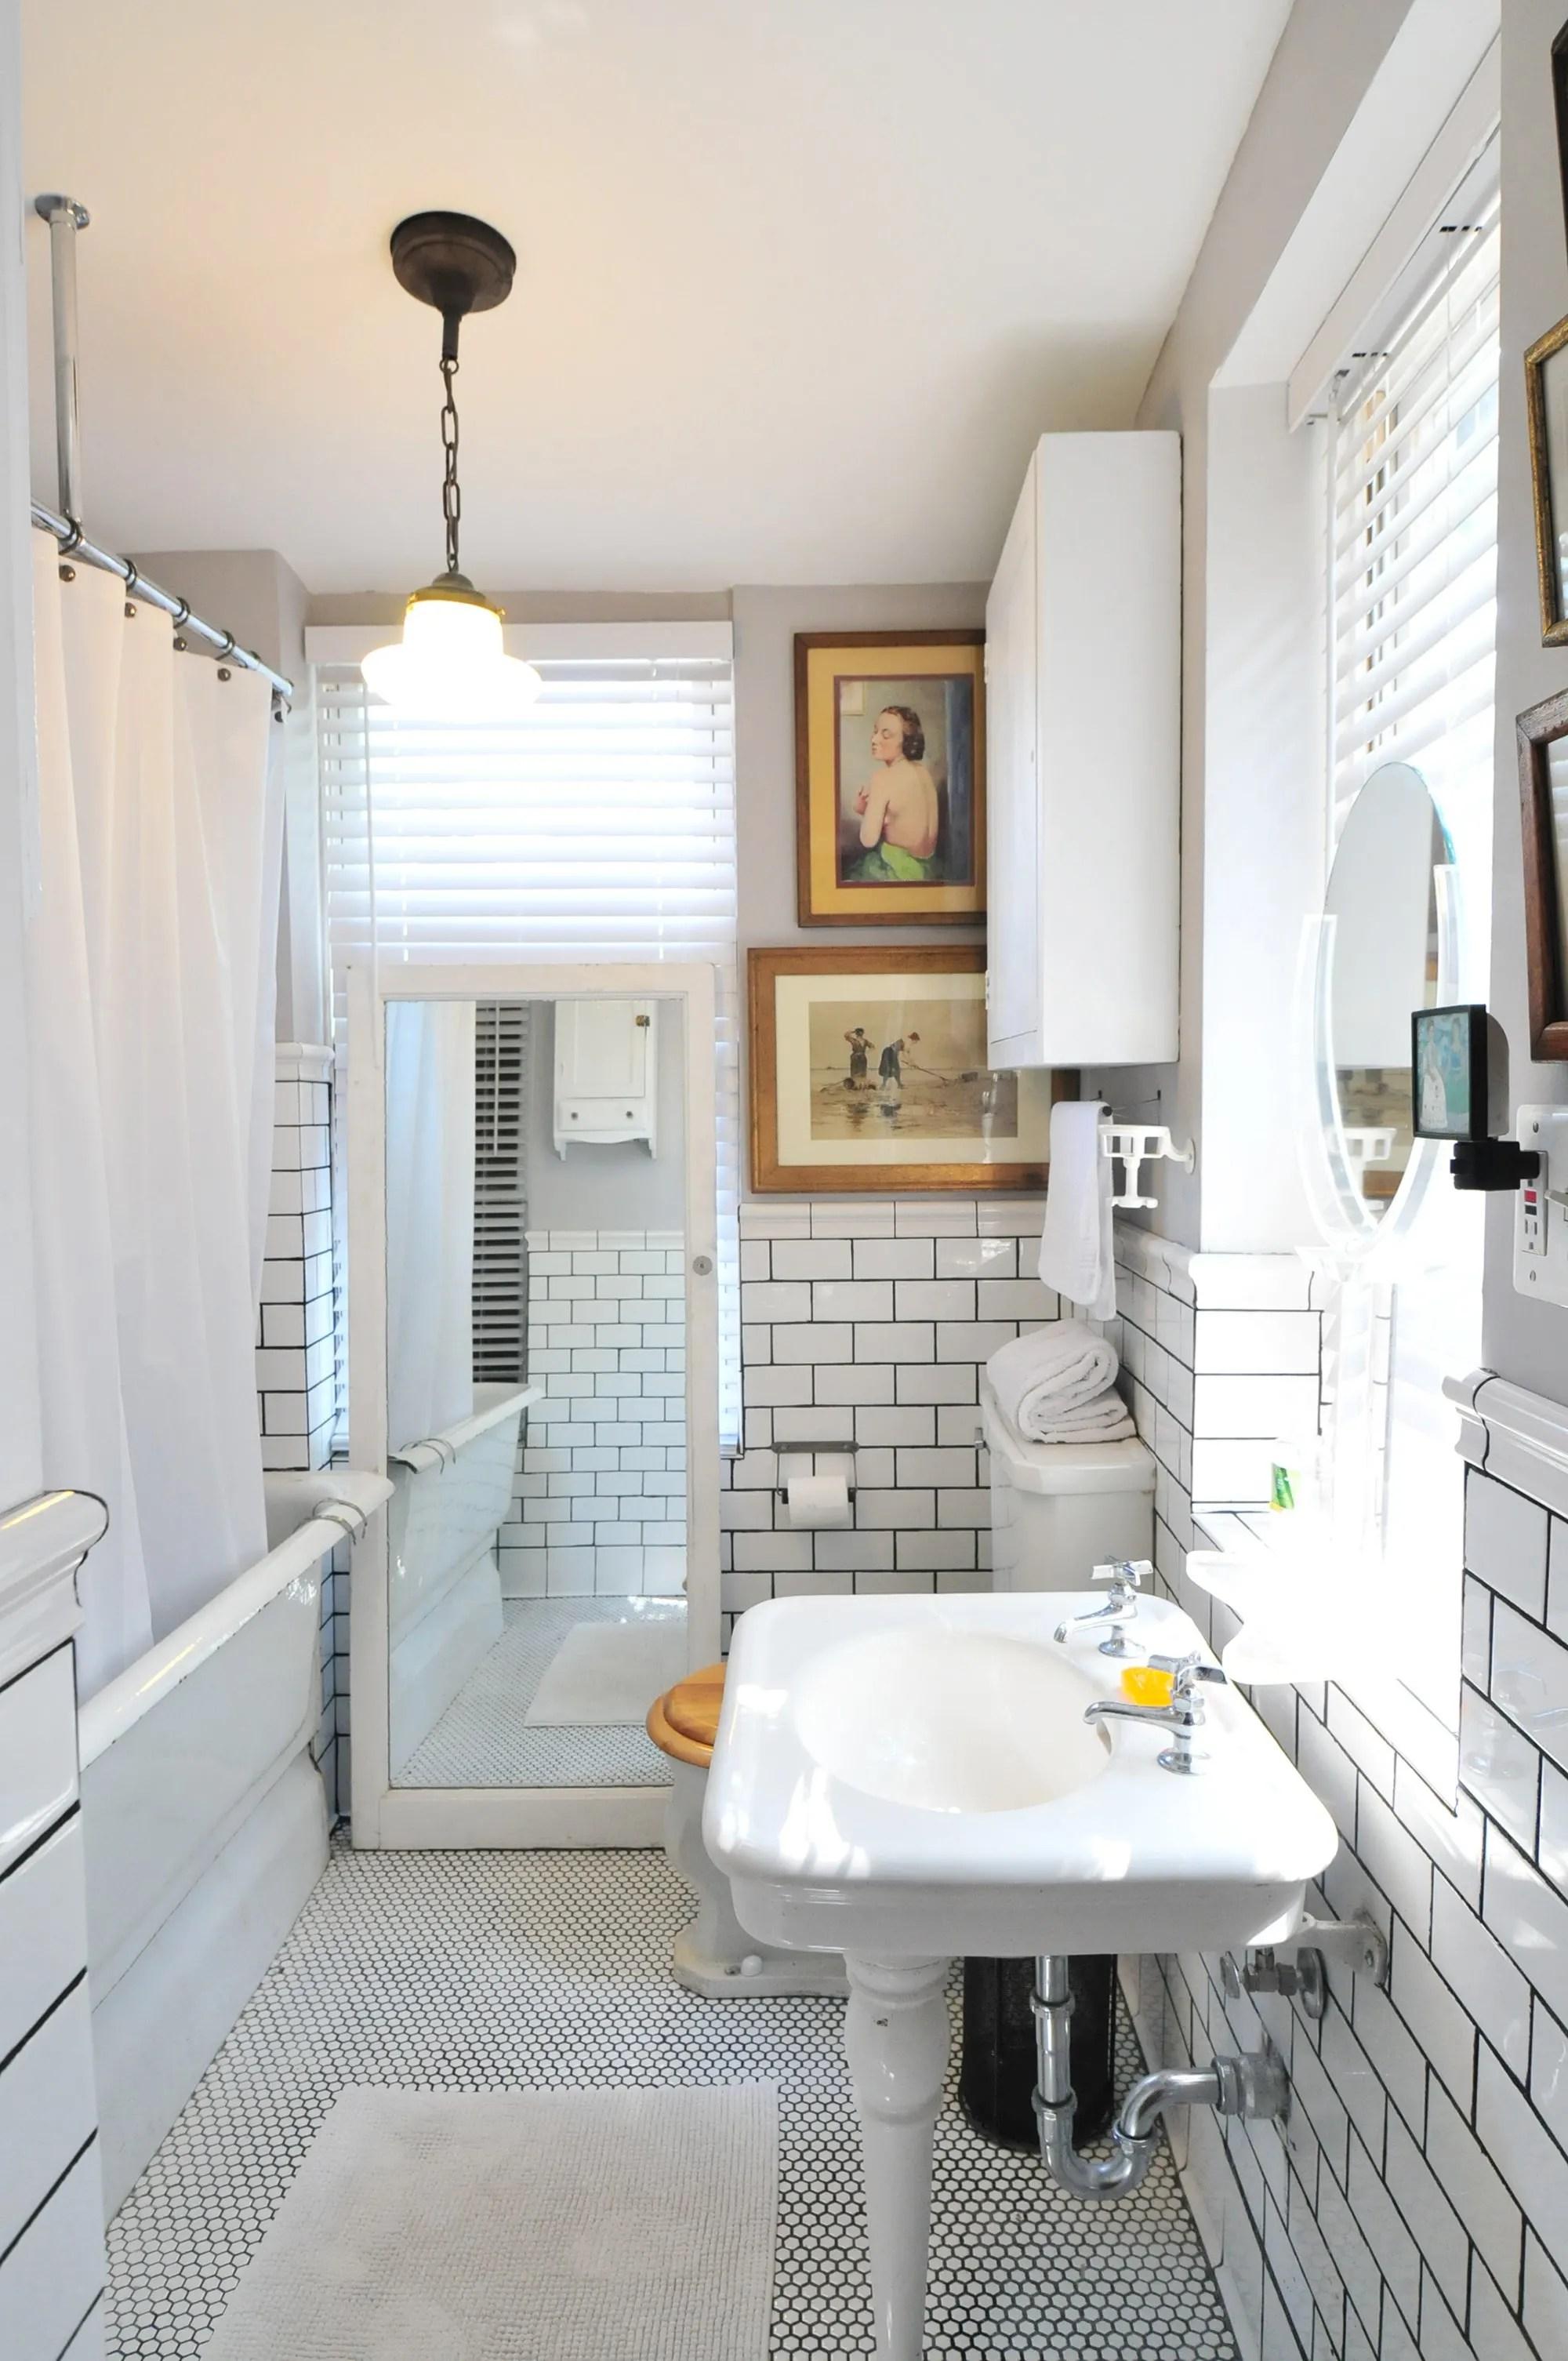 50 Best Bathroom Design Ideas | Apartment Therapy on Apartment Bathroom Ideas  id=68818